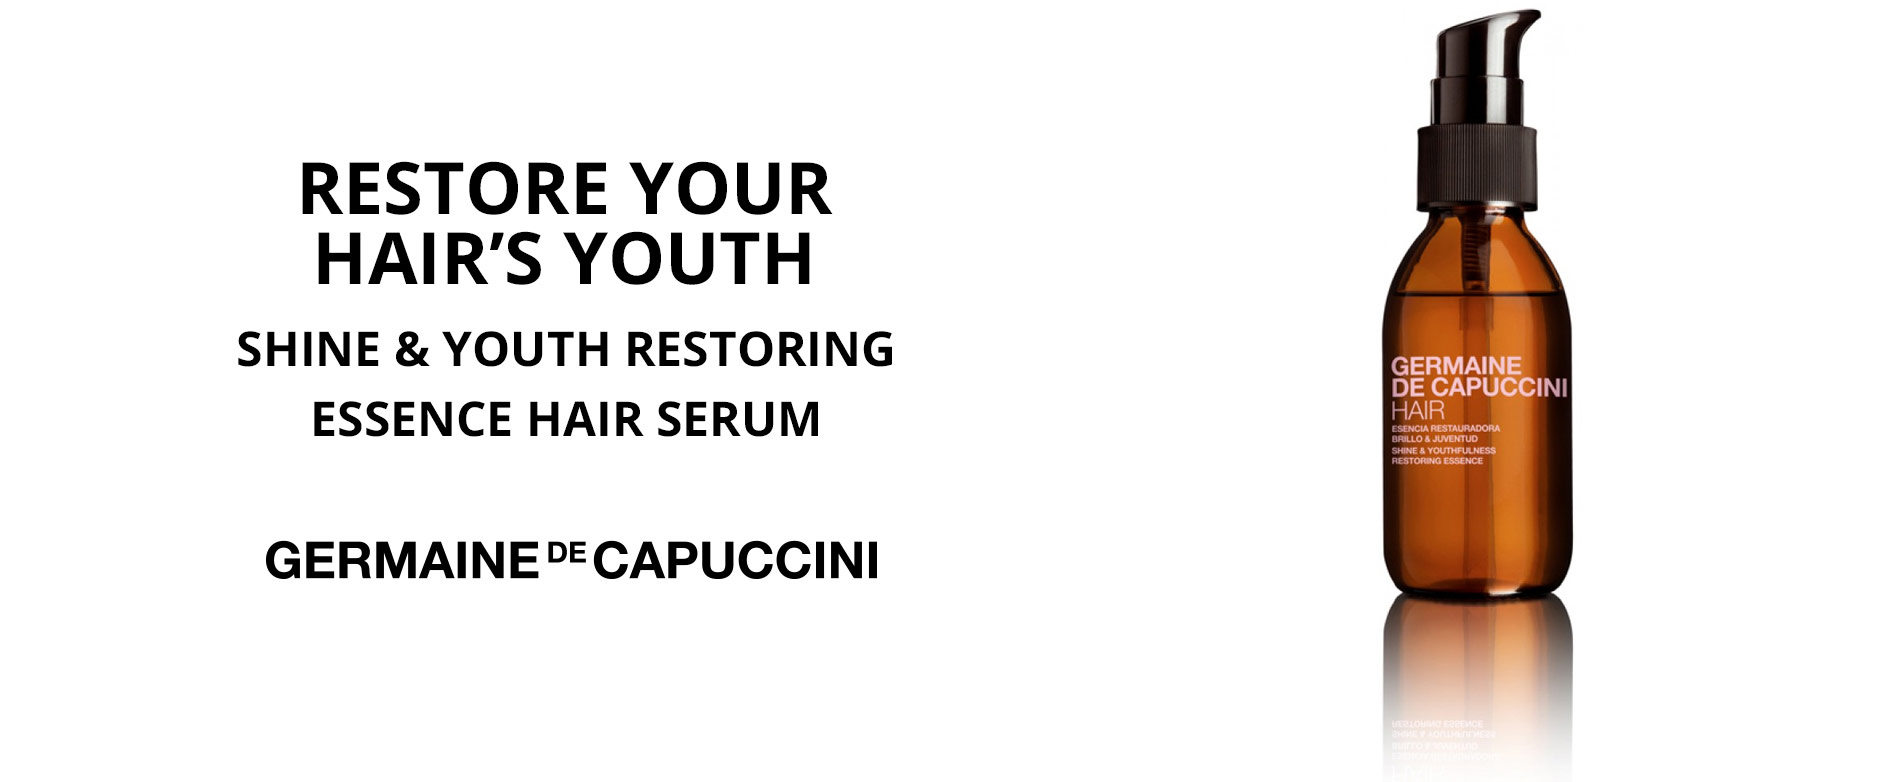 Shine & Youth Restoring Essence Hair Serum